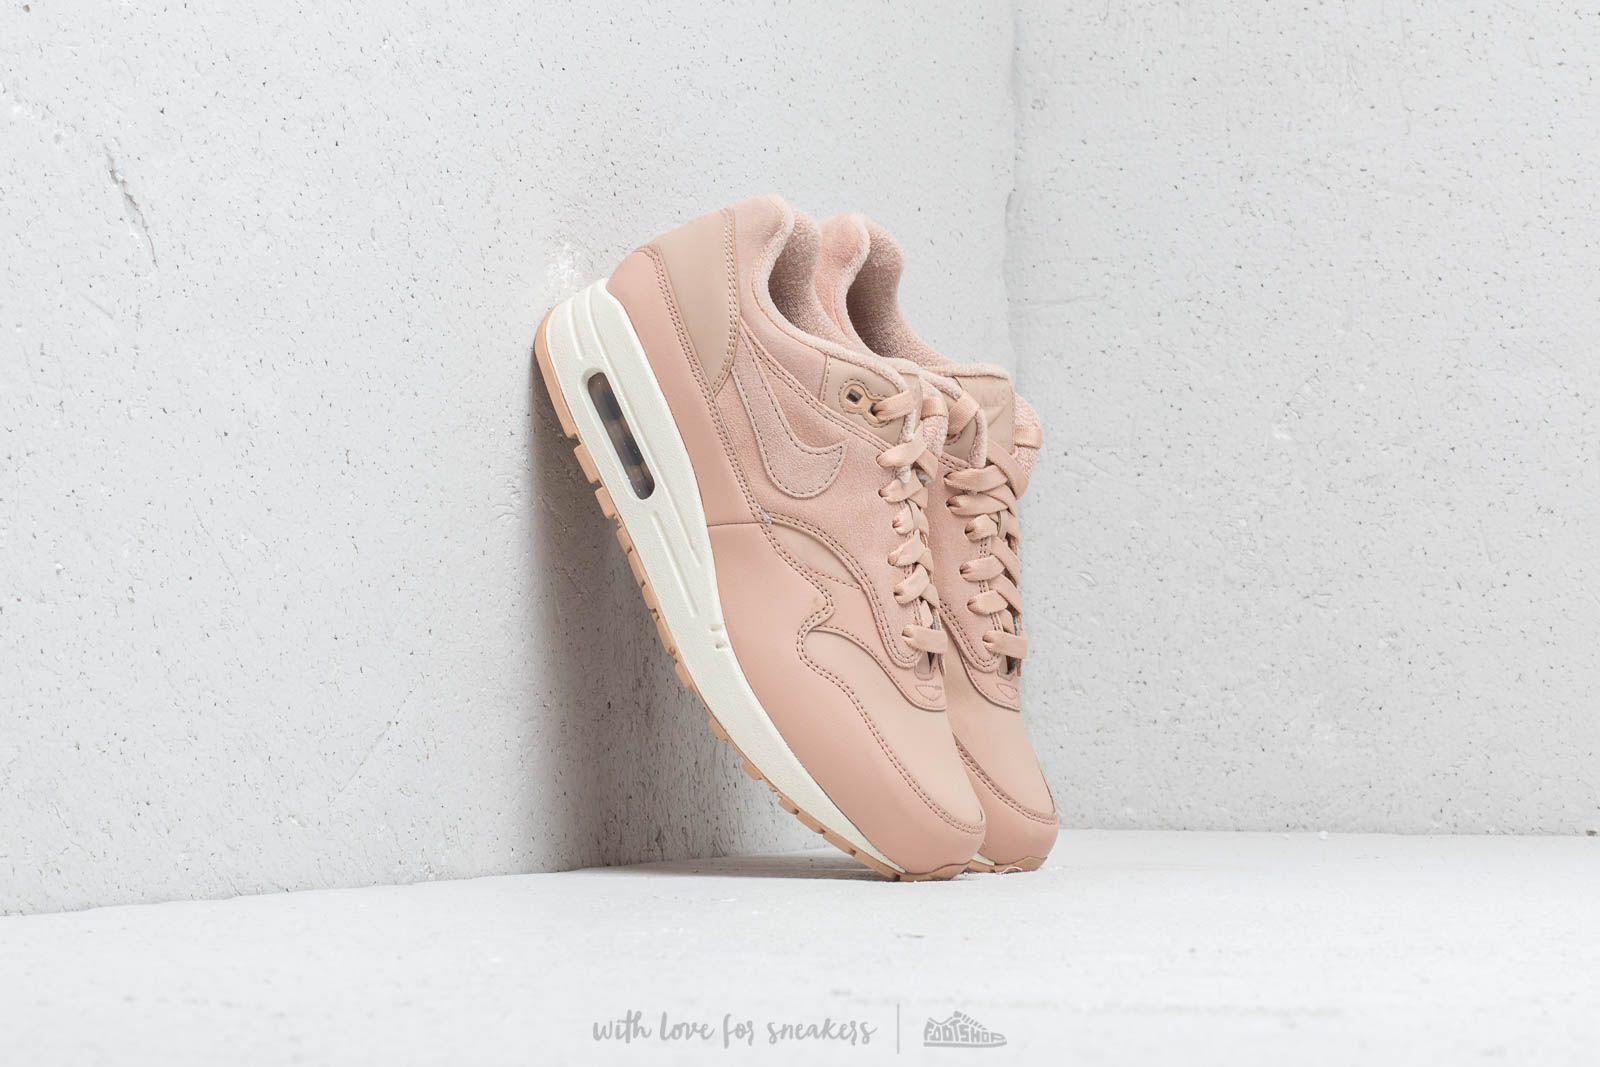 Nike Wm's Air Max 1 Premium